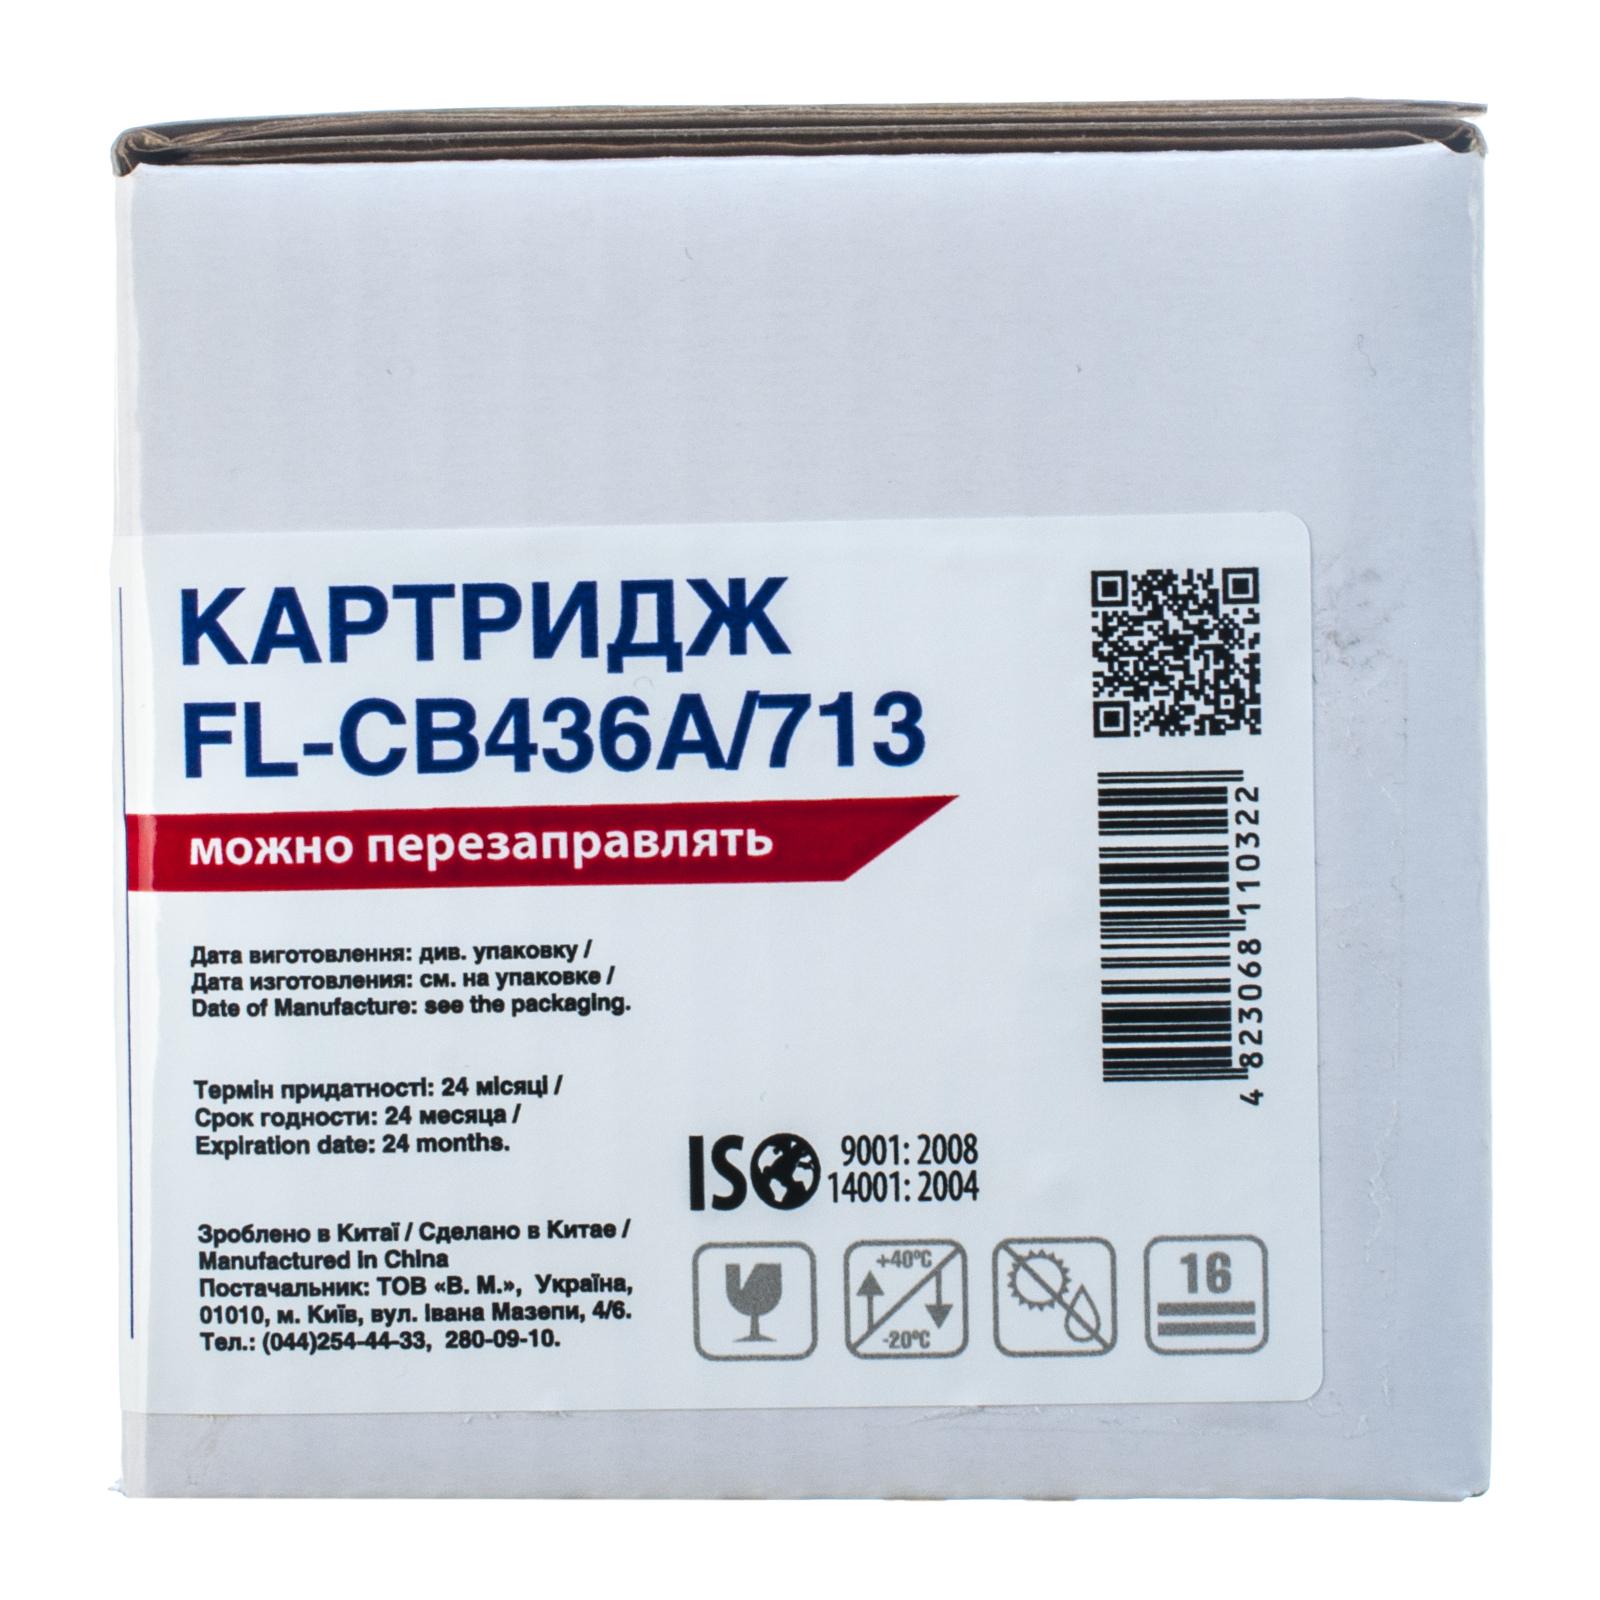 Картридж FREE Label HP LJ CB436A/CANON 713 (FL-CB436A/713) изображение 3